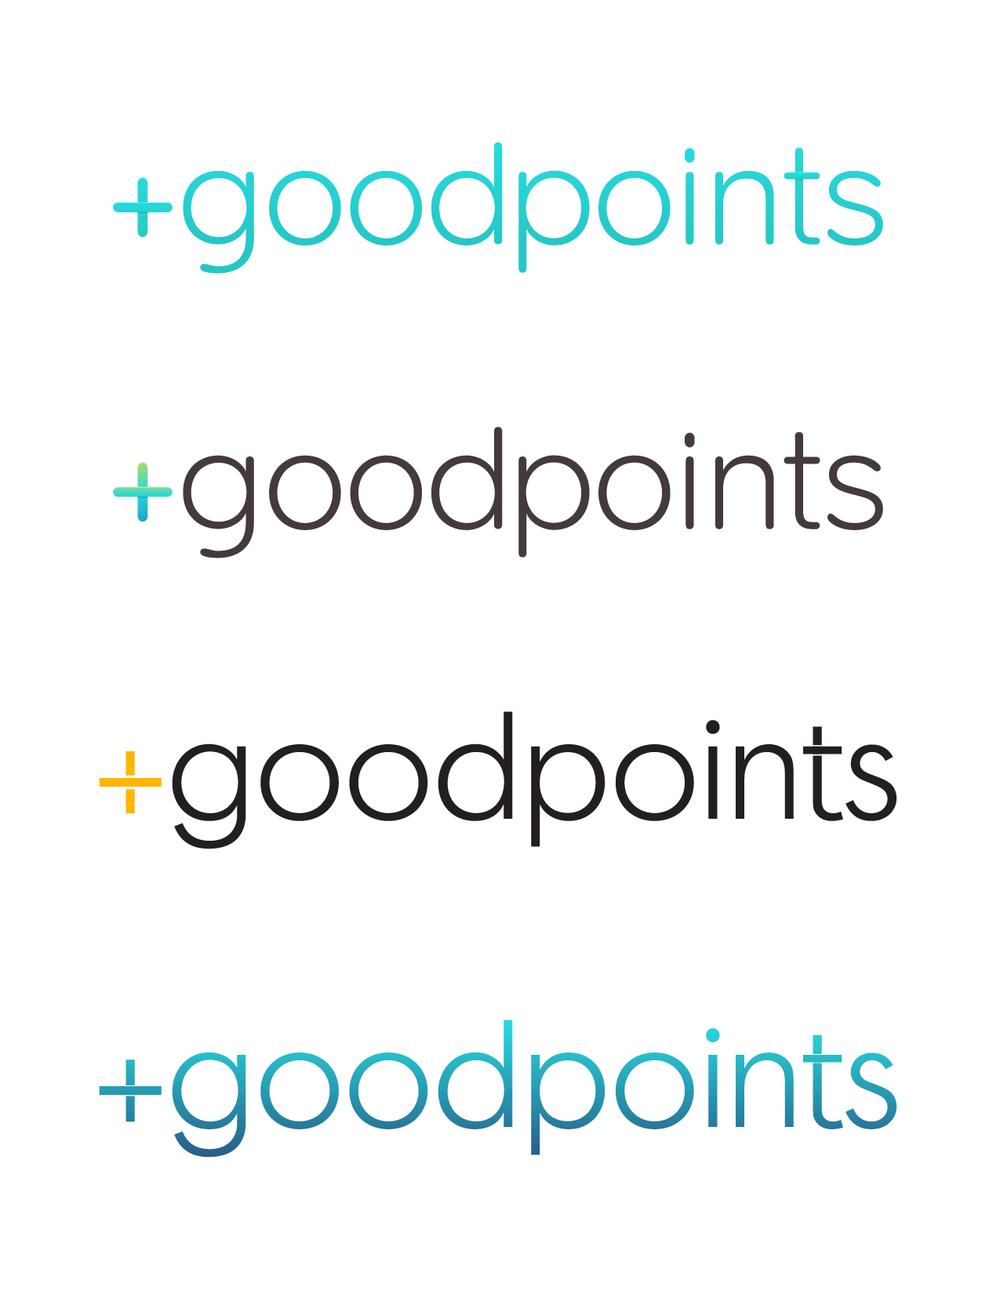 goodpoints_branding_06142016-03.png